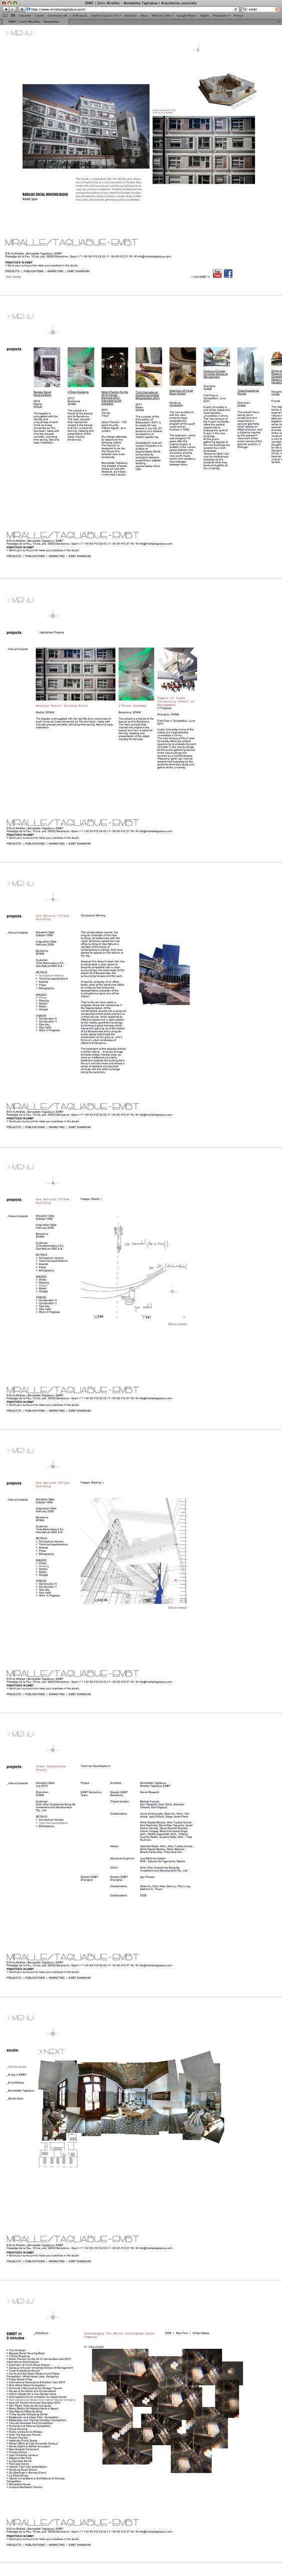 Official website of the architectural studio EMBT Miralles Tagliabue. Design: albertclaret.com